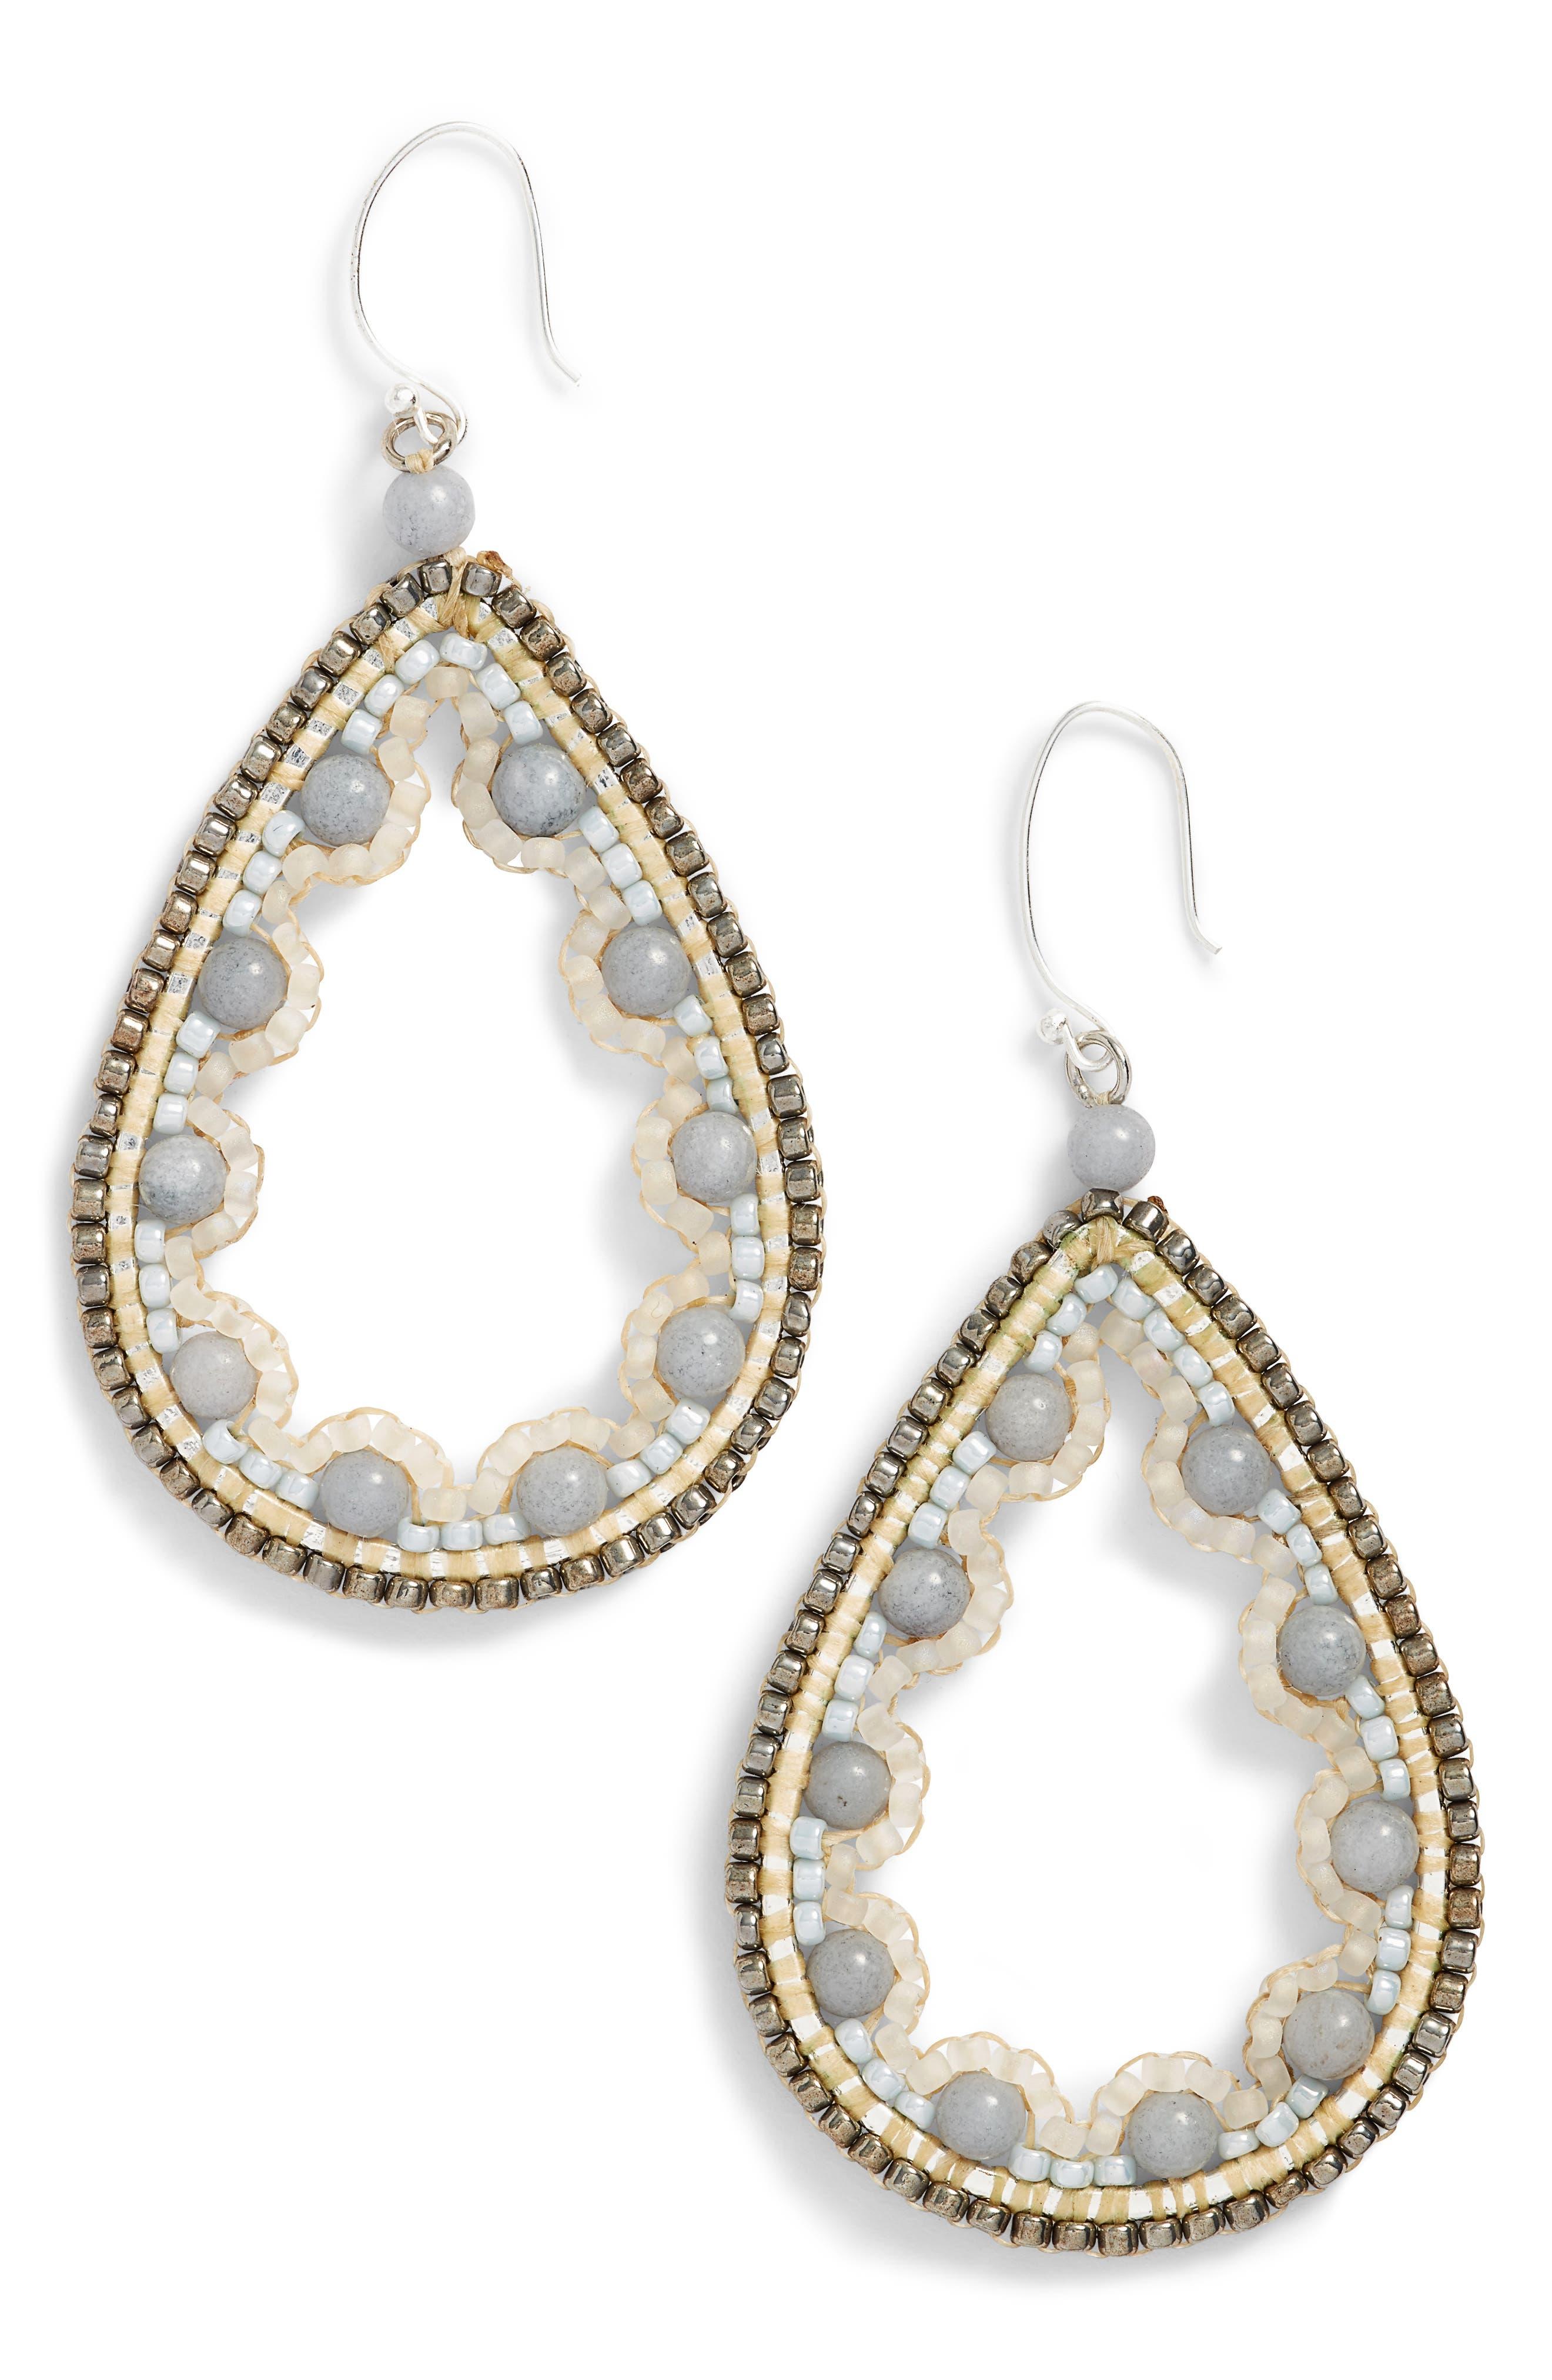 Beaded Agate Teardrop Earrings,                             Main thumbnail 1, color,                             100